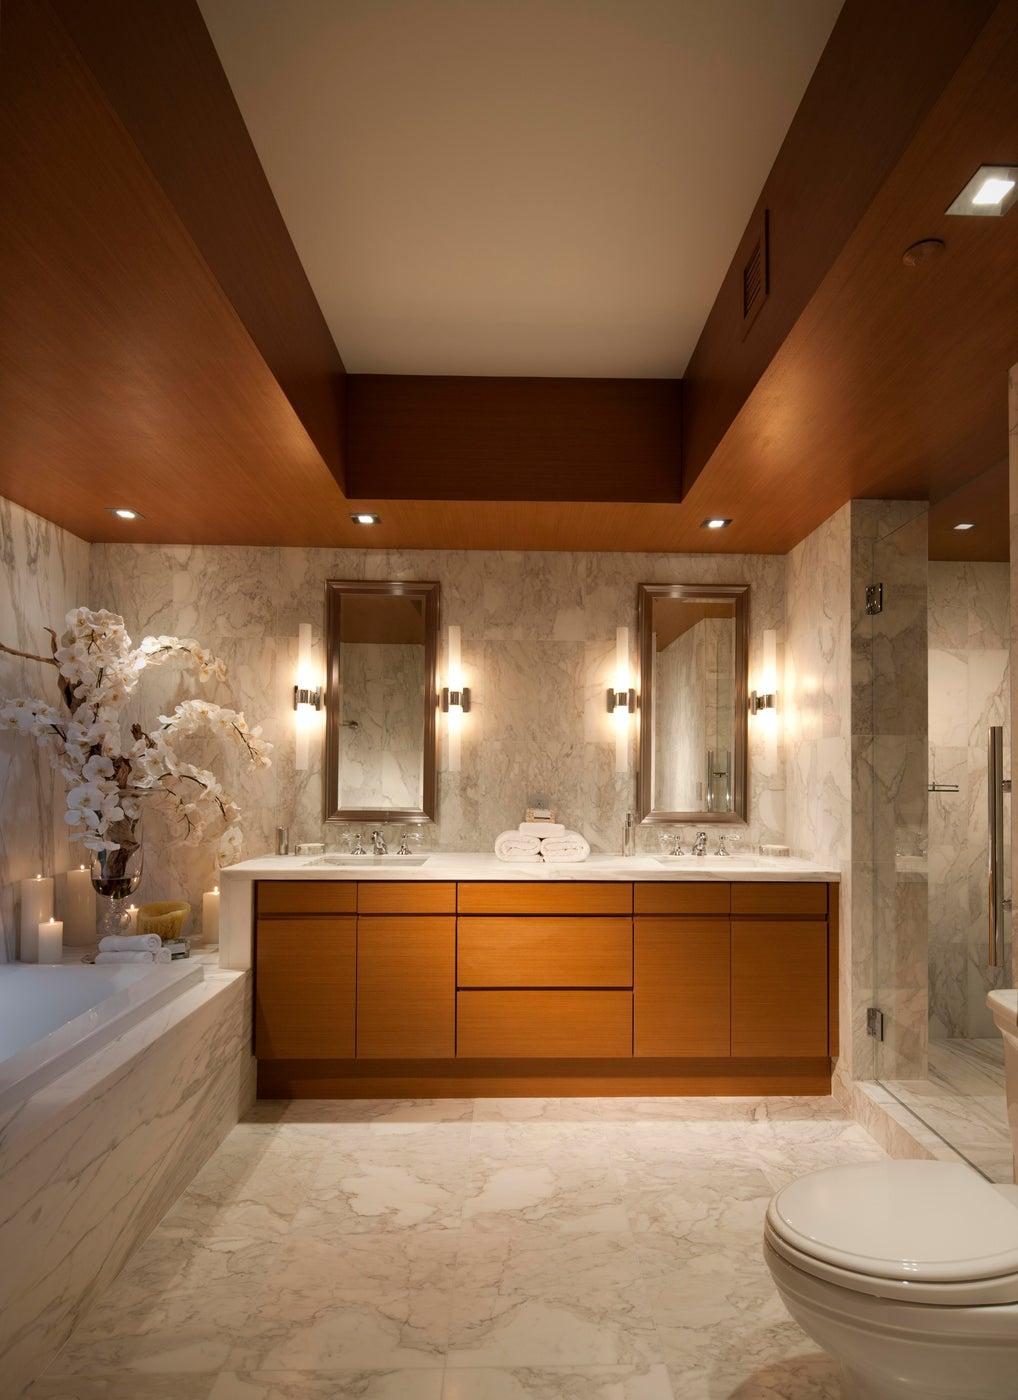 Murano Portofino South Beach - Bathroom